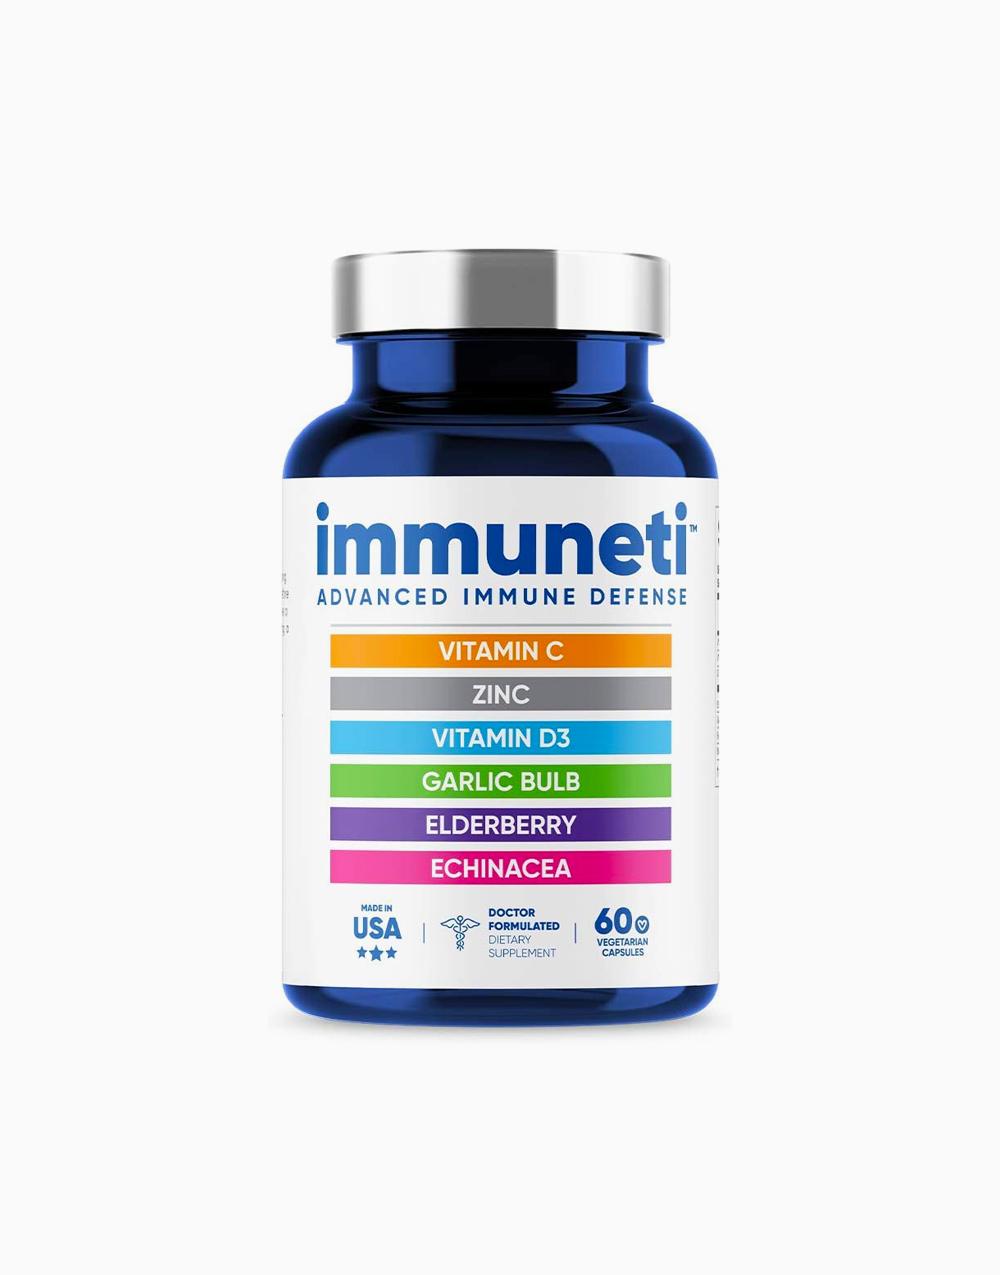 Immuneti Advanced 6-in-1 Immune Defense with Vitamin C, Zinc, Vitamin D3, Garlic Bulb, Elderberry, Echinacea 60 Vegetarian Capsules by Immuneti